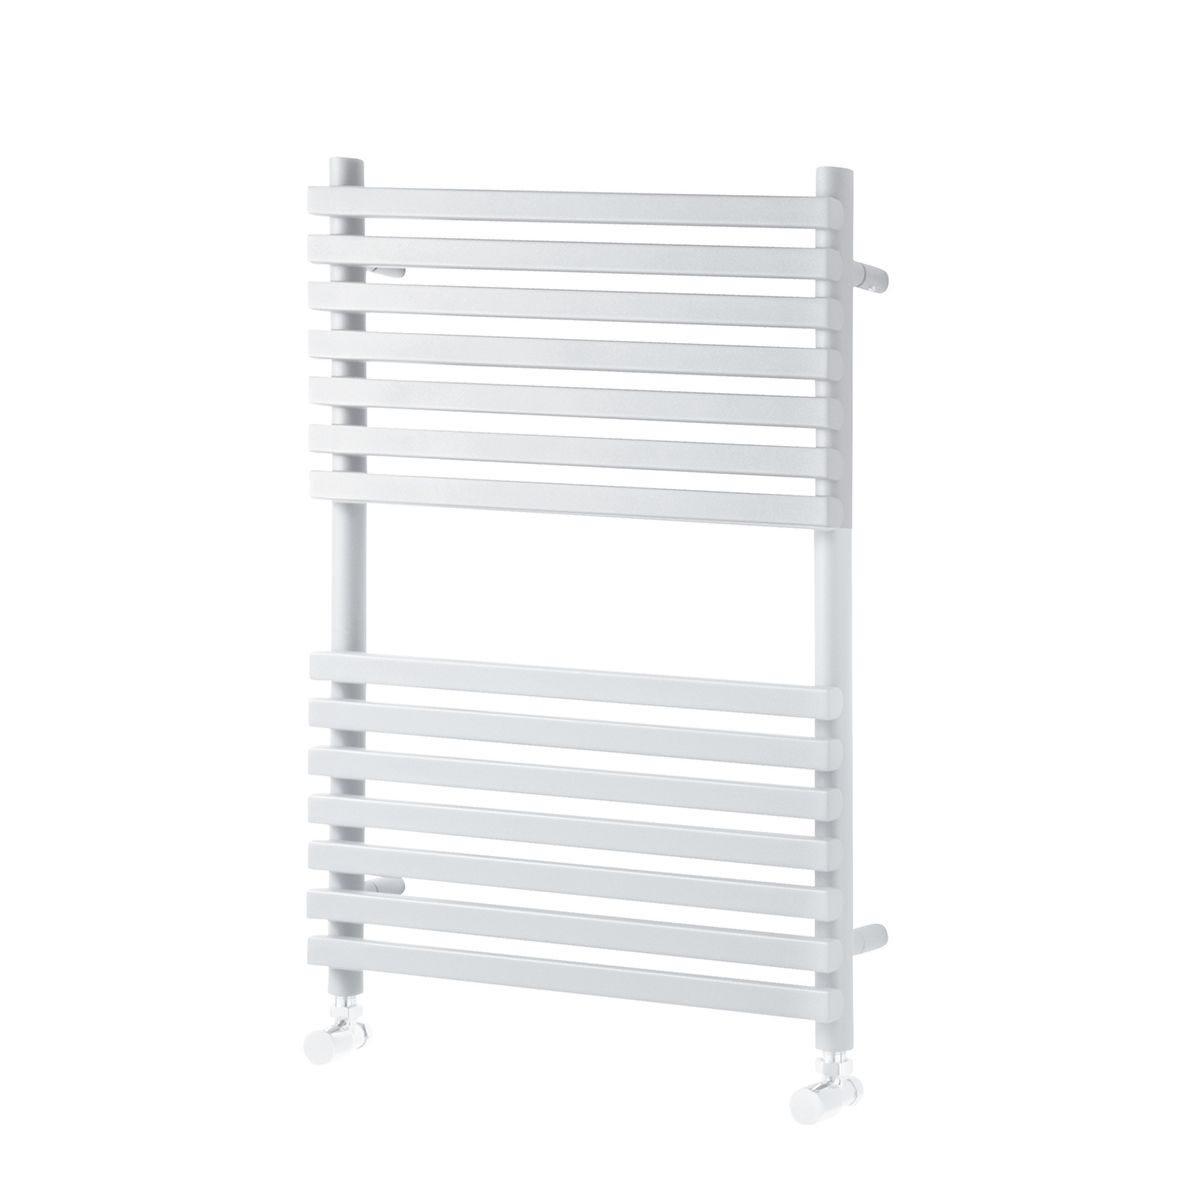 Towelrads Oxfordshire Ladder Towel Rail Radiator - White 1500x500